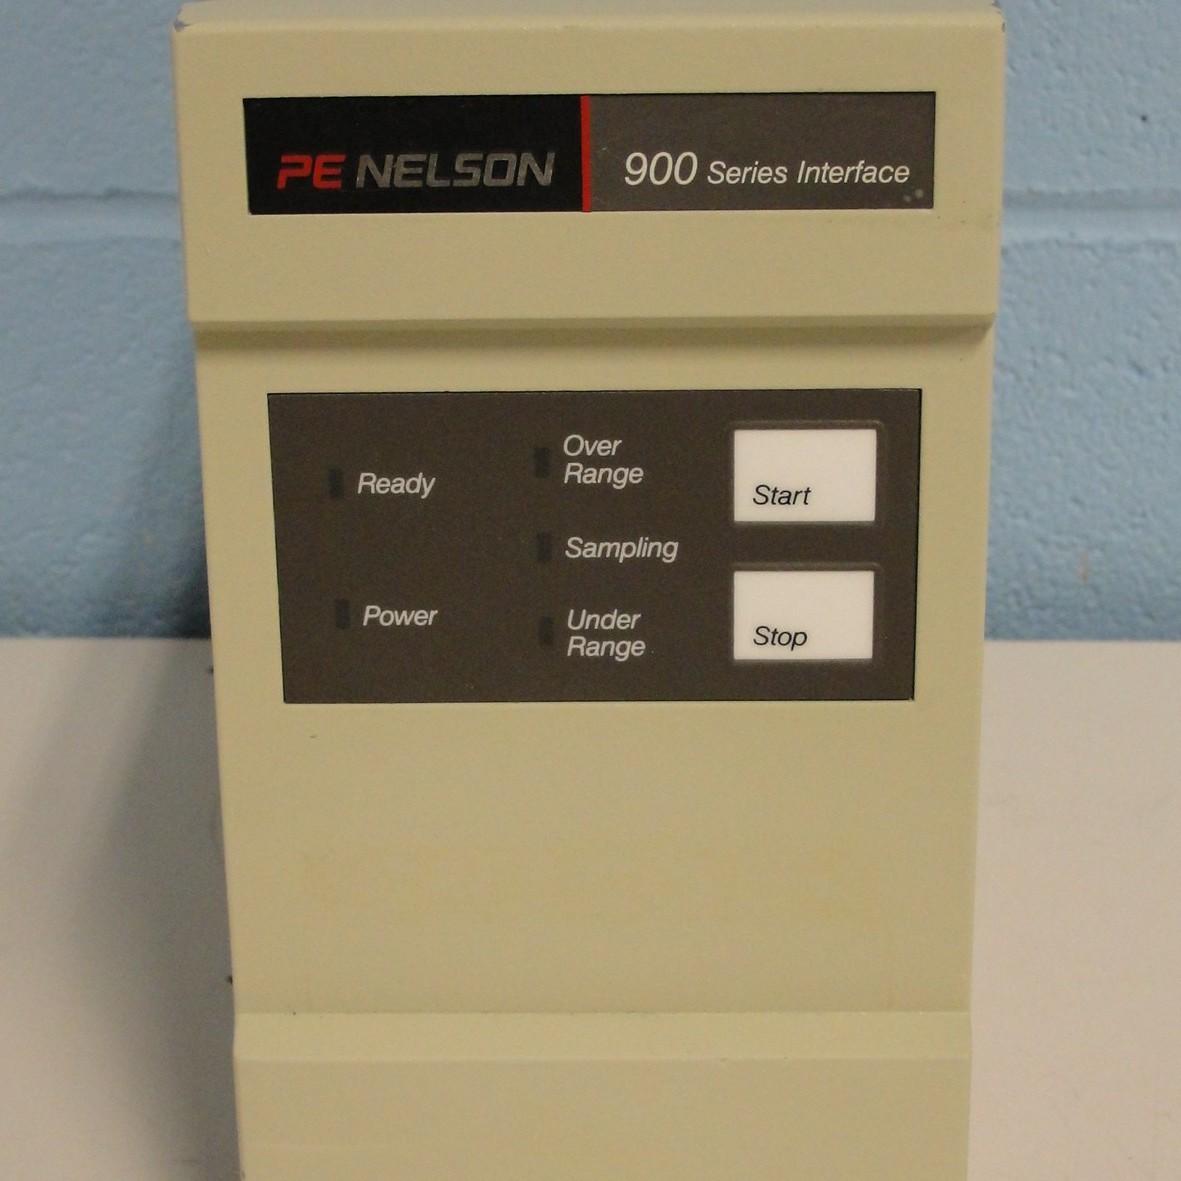 Perkin Elmer PE Nelson 900 Series Interface Model 970 Image